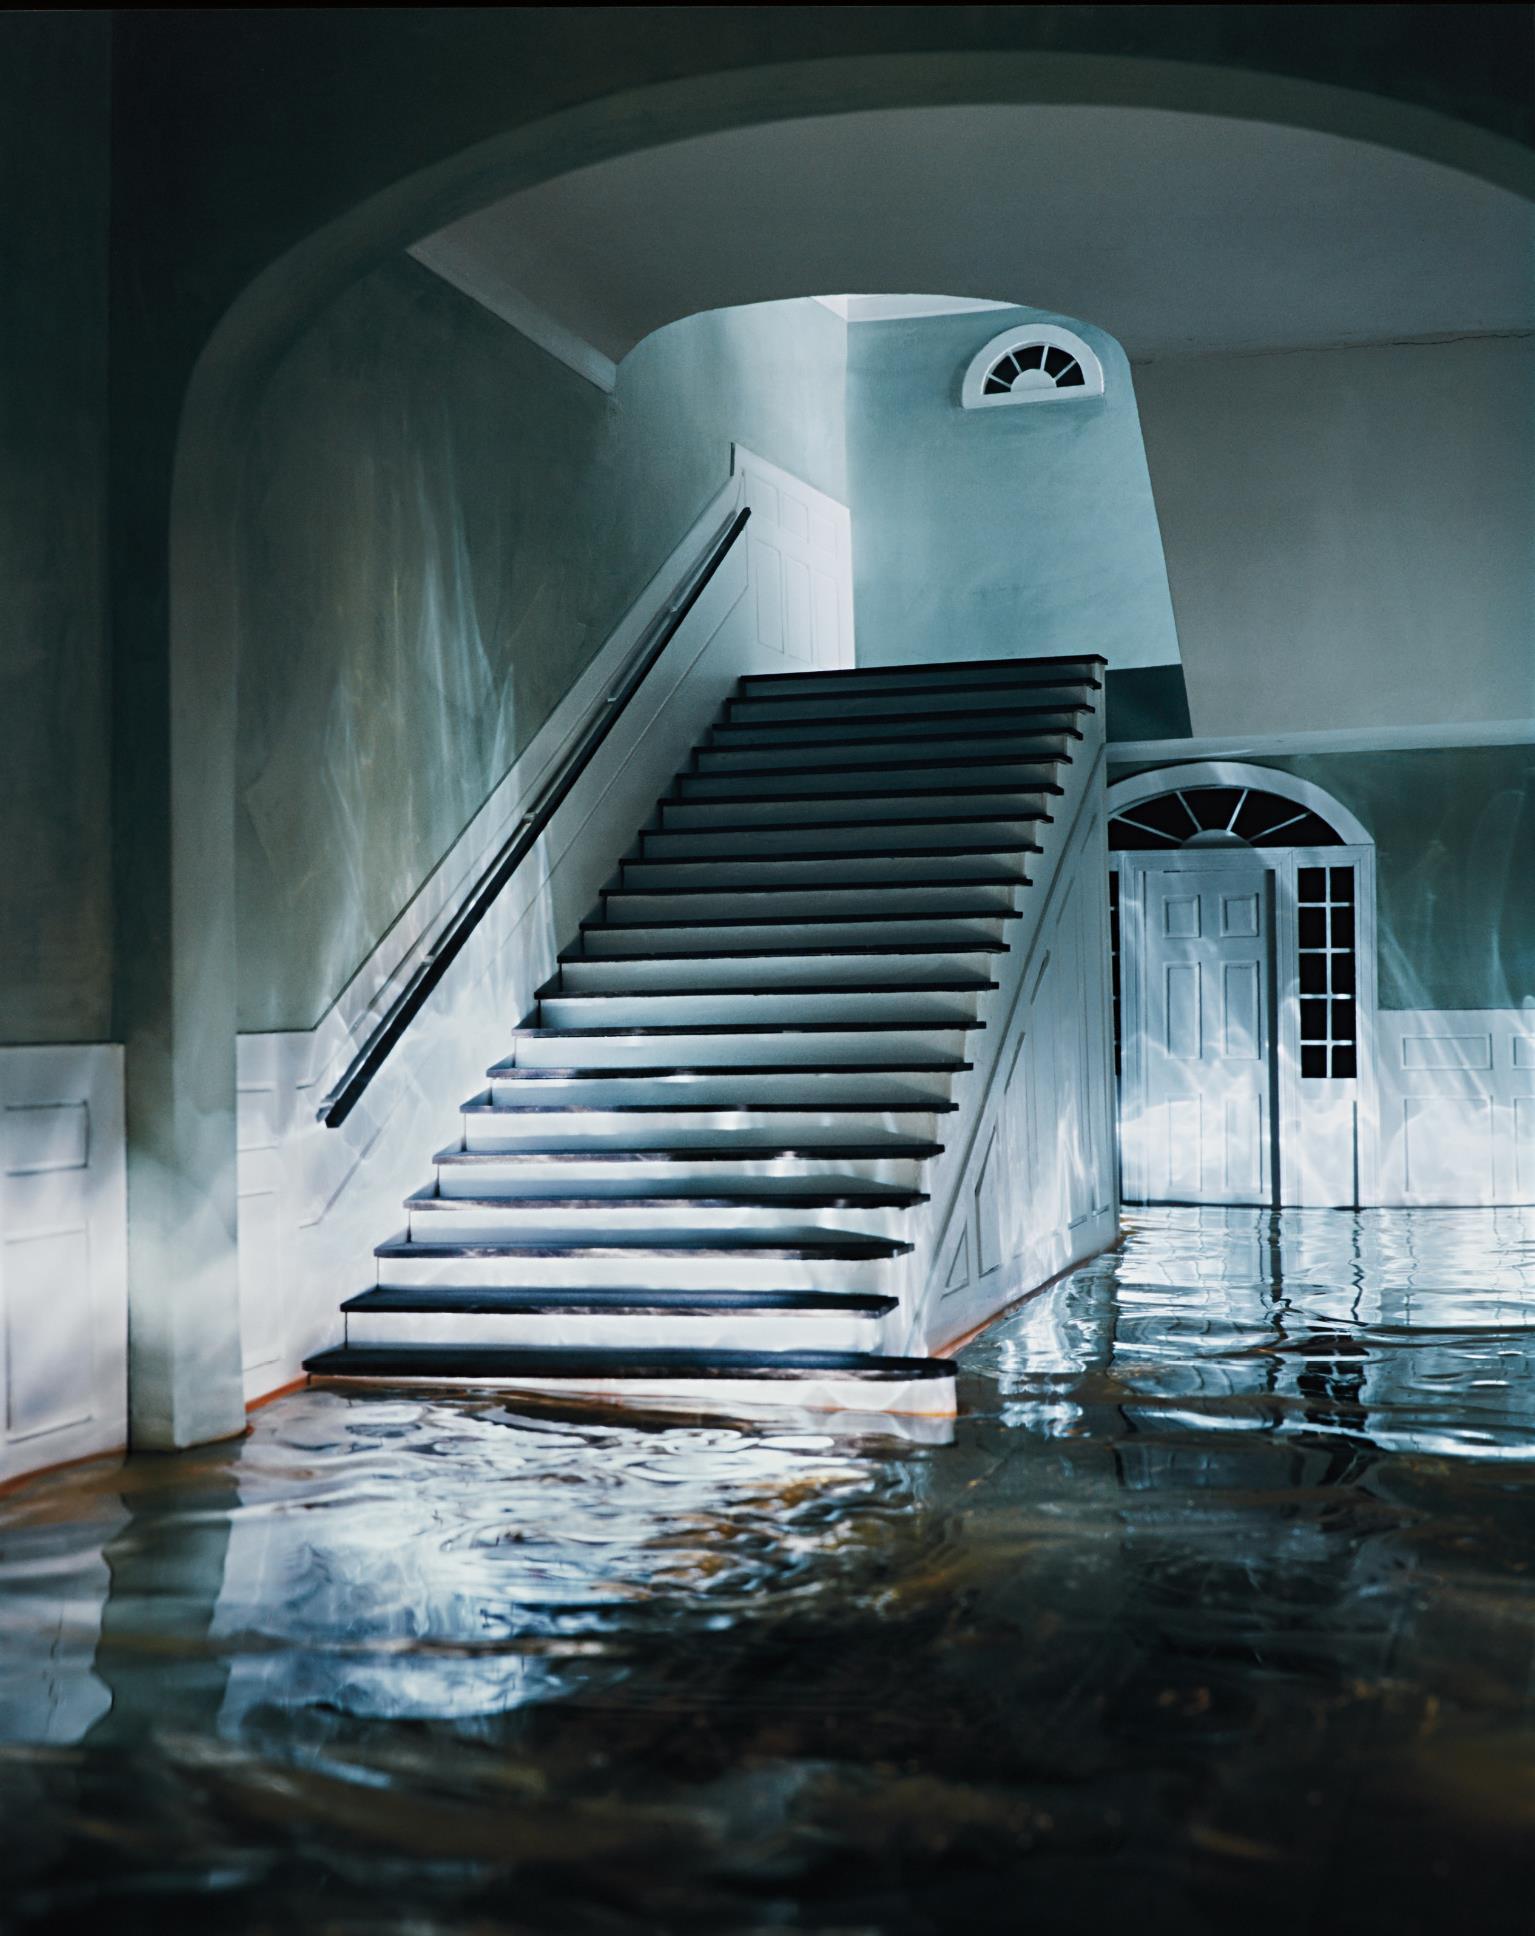 James Casebere-The Green Staircase #1-2002